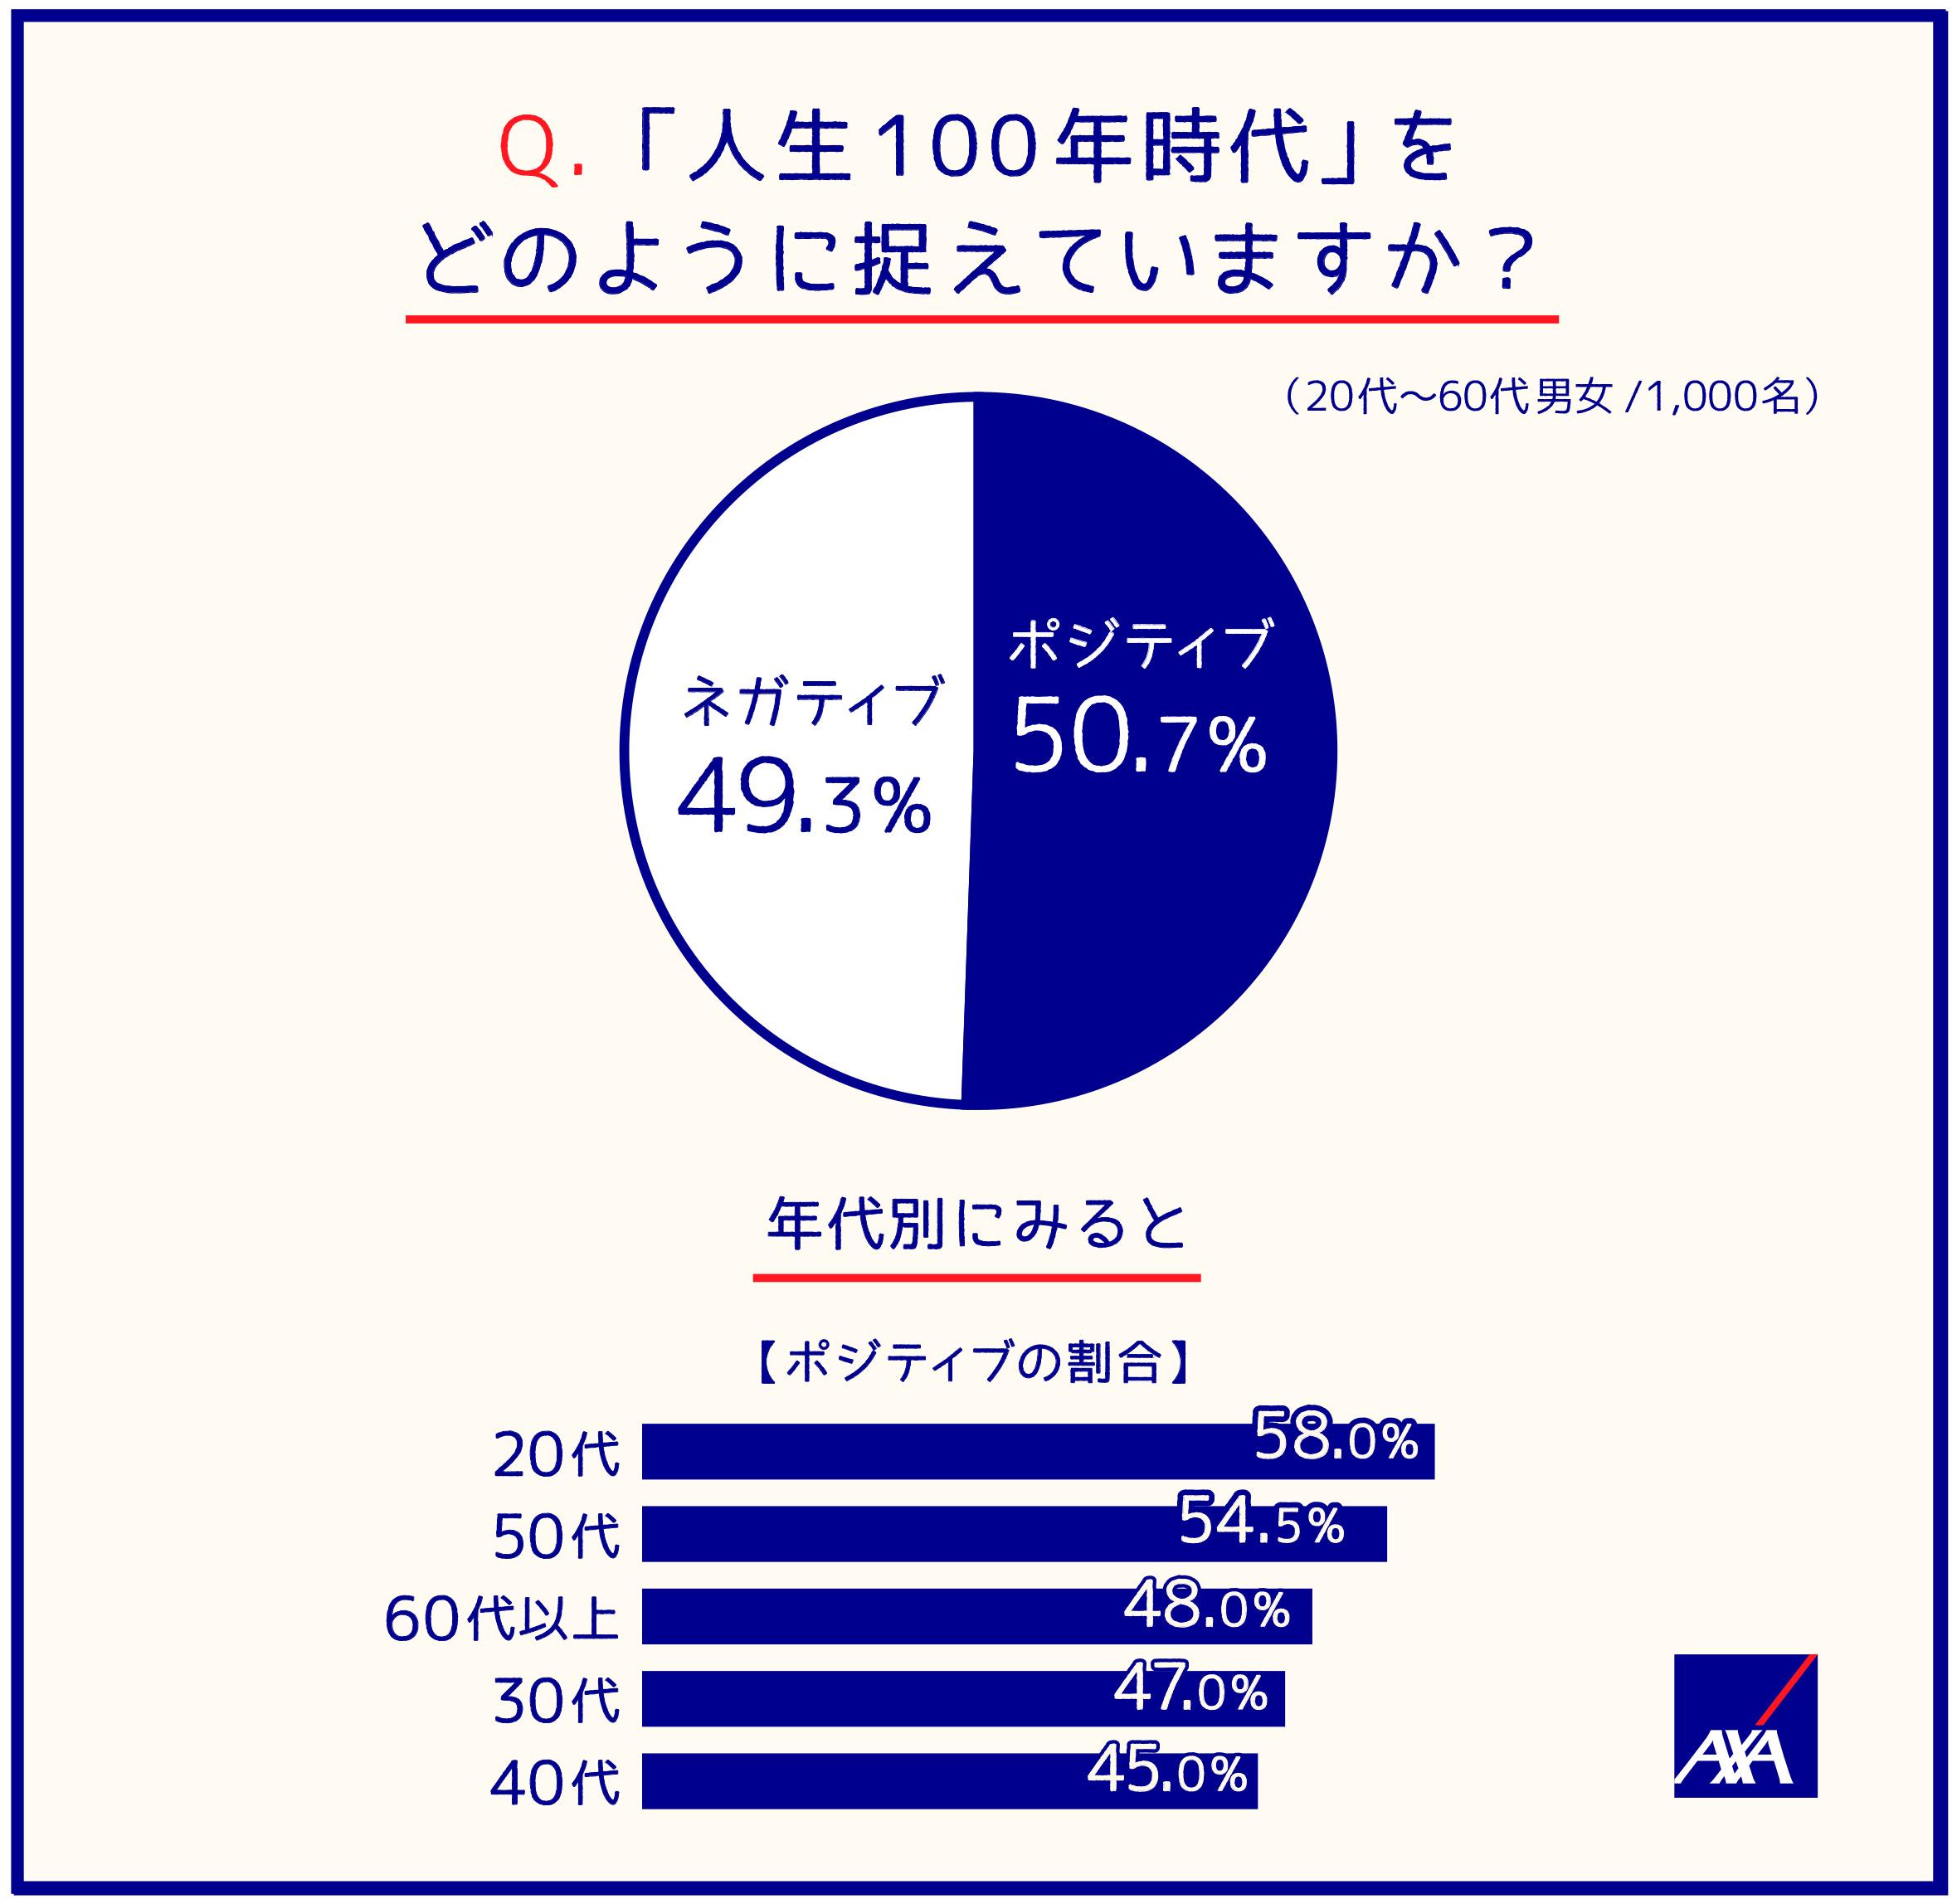 Q.「人生100年時代」をどのように捉えていますか?(20代~60代男女/1,000名) ポジティブ;50.7'% ネガティブ;49.3% 年代別にみると(ポジティブの場合) 20代;58.0% 50代;54.5% 60代以上;48.0% 30代;47.0% 40代;45.0%